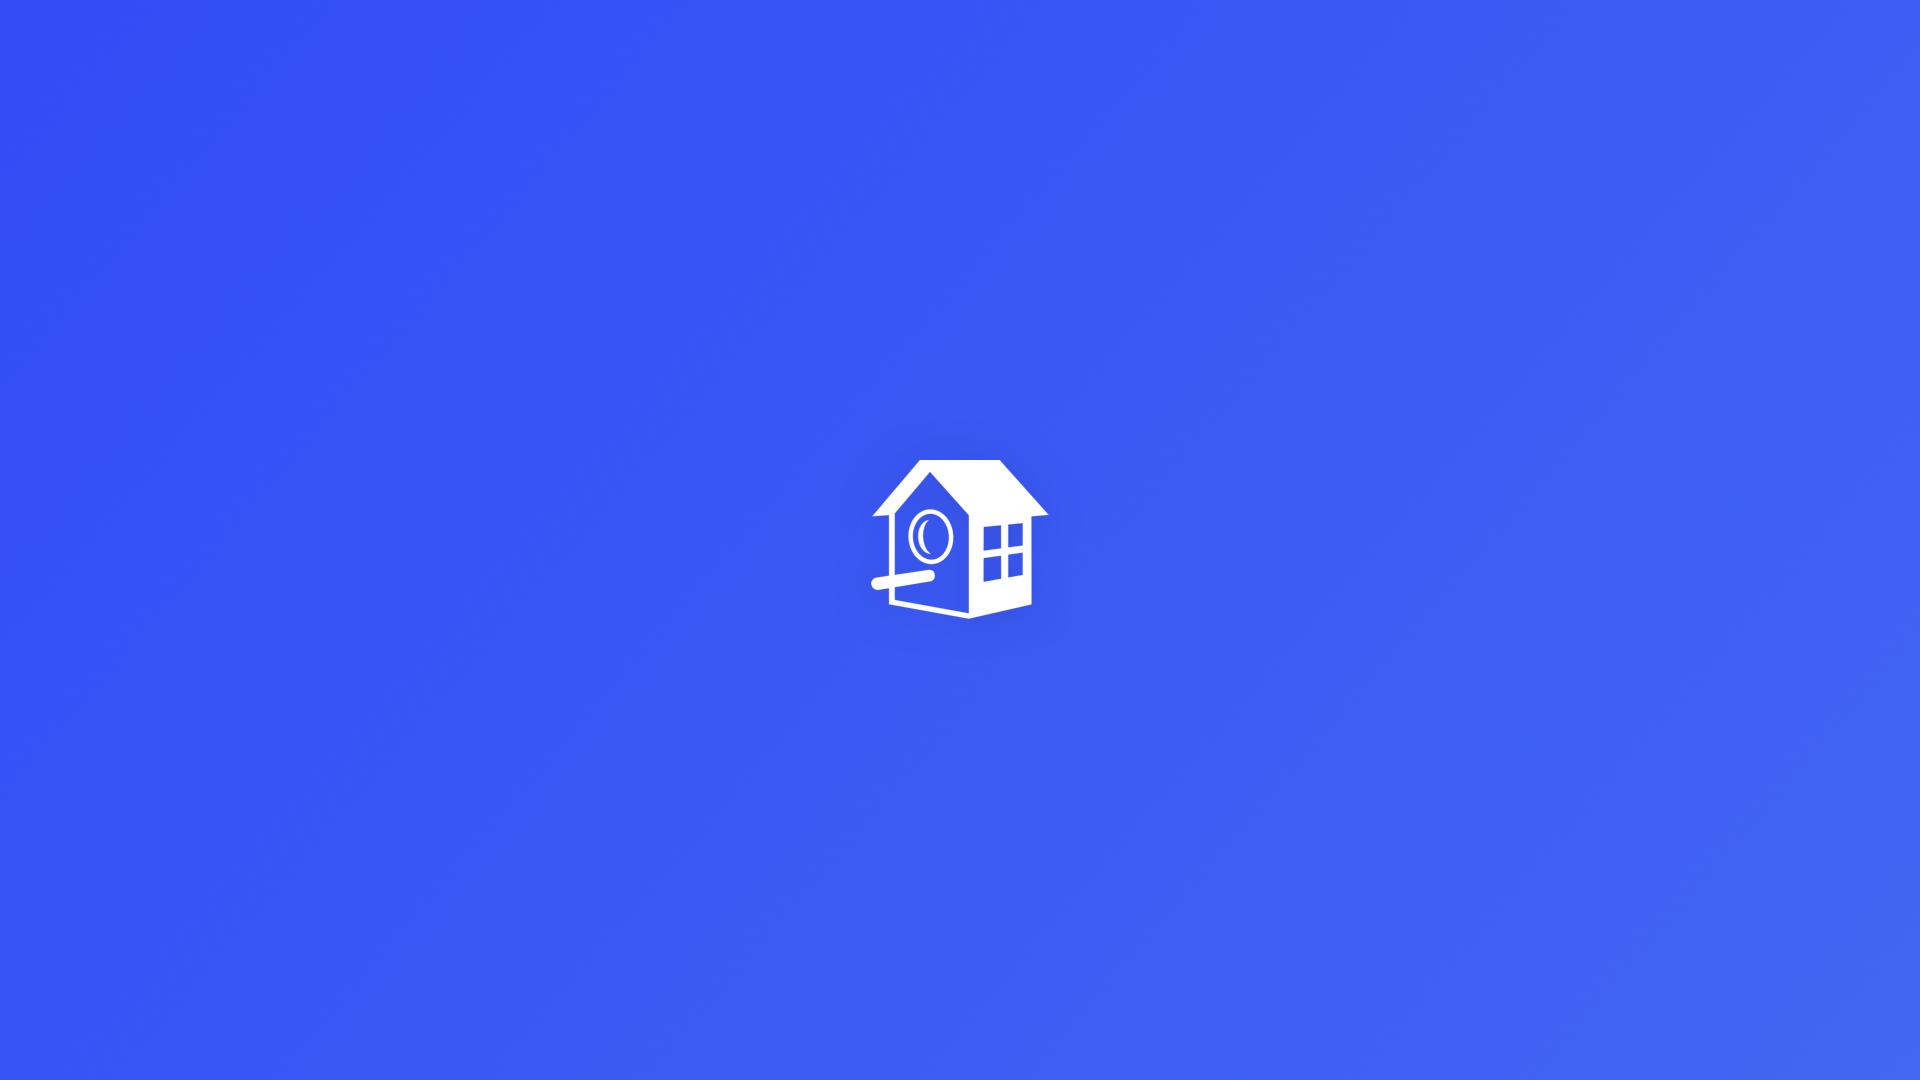 Liliia_Mandrino_Design_FB_2019.042